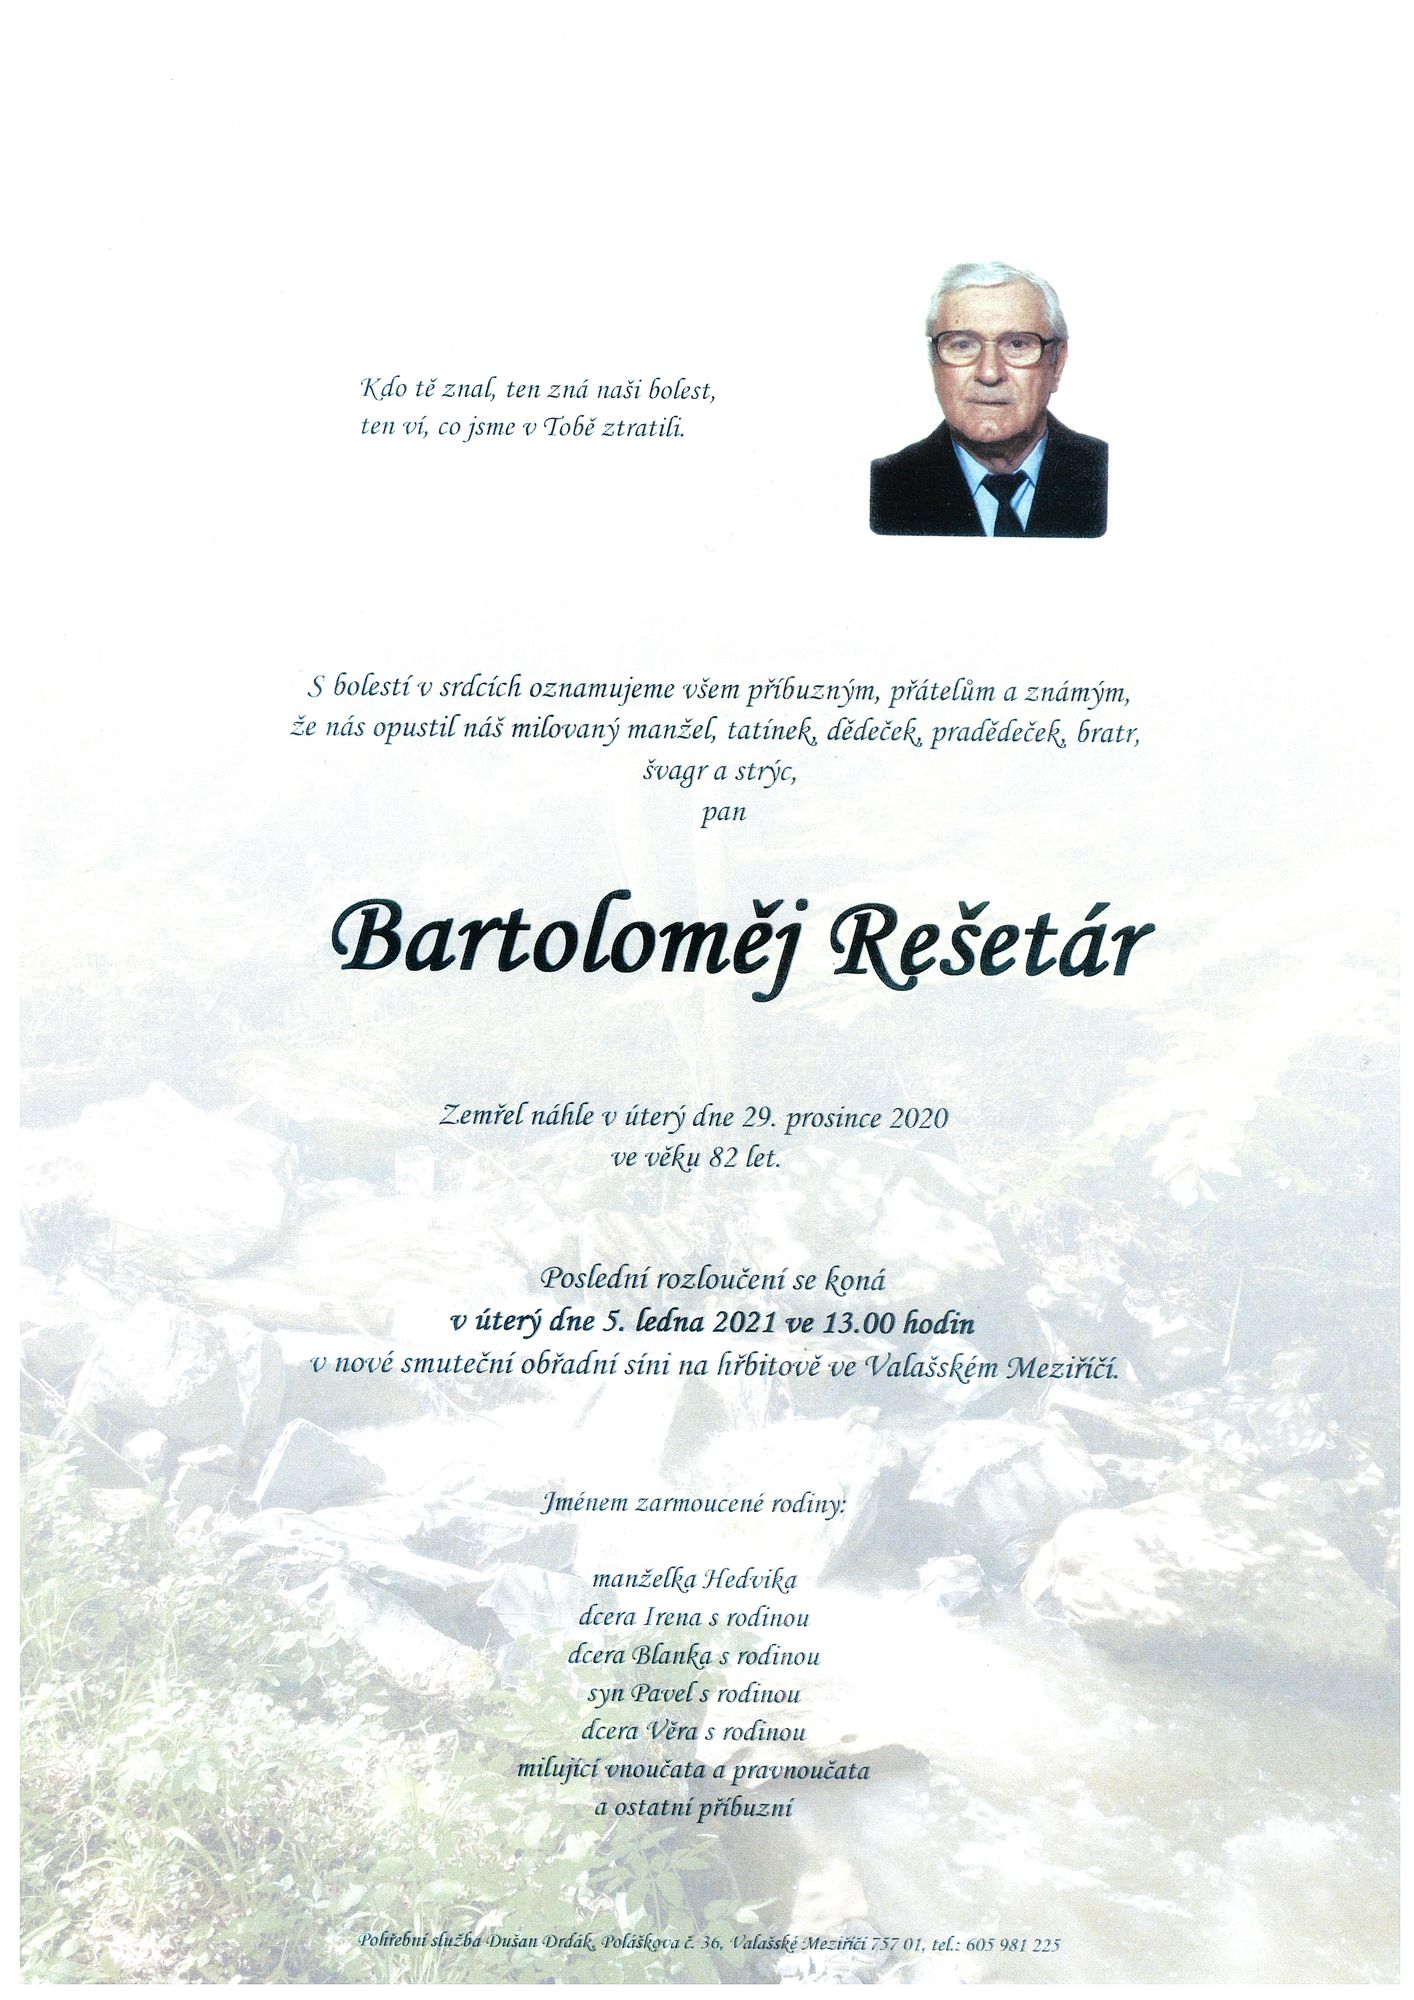 Bartoloměj Rešetár